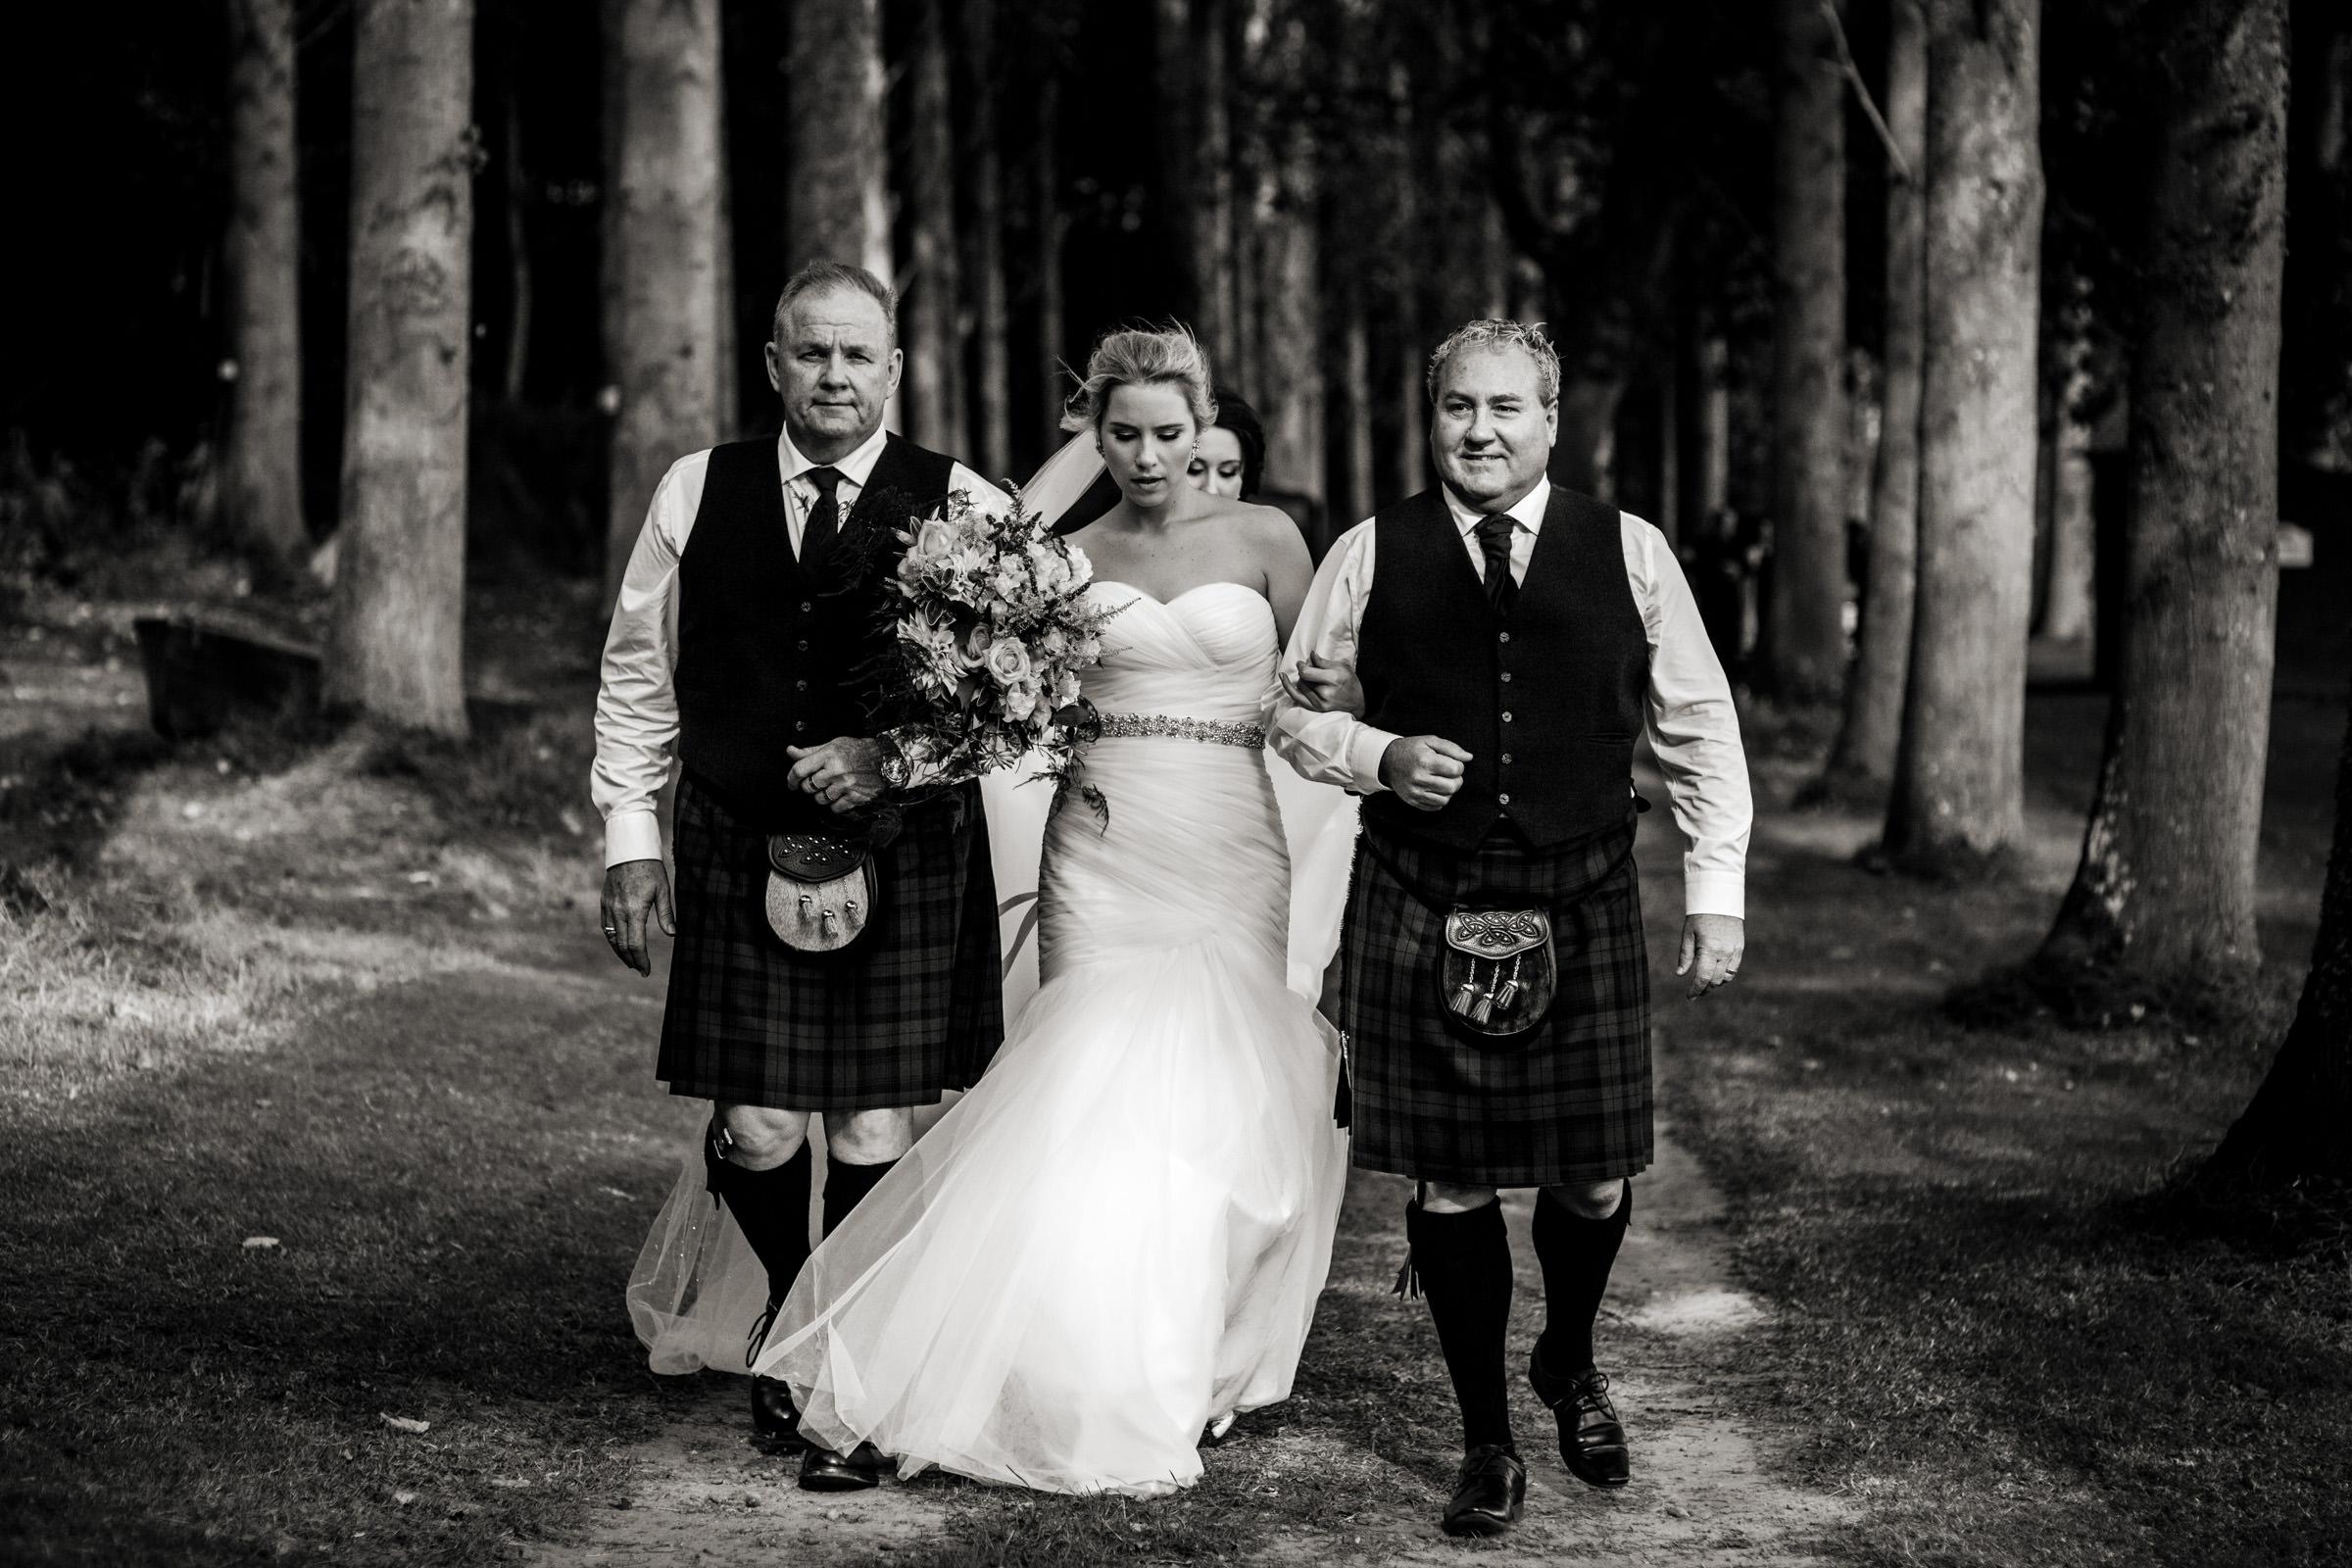 Documentart wedding photographers Berwick-upon-Tweed 006.jpg